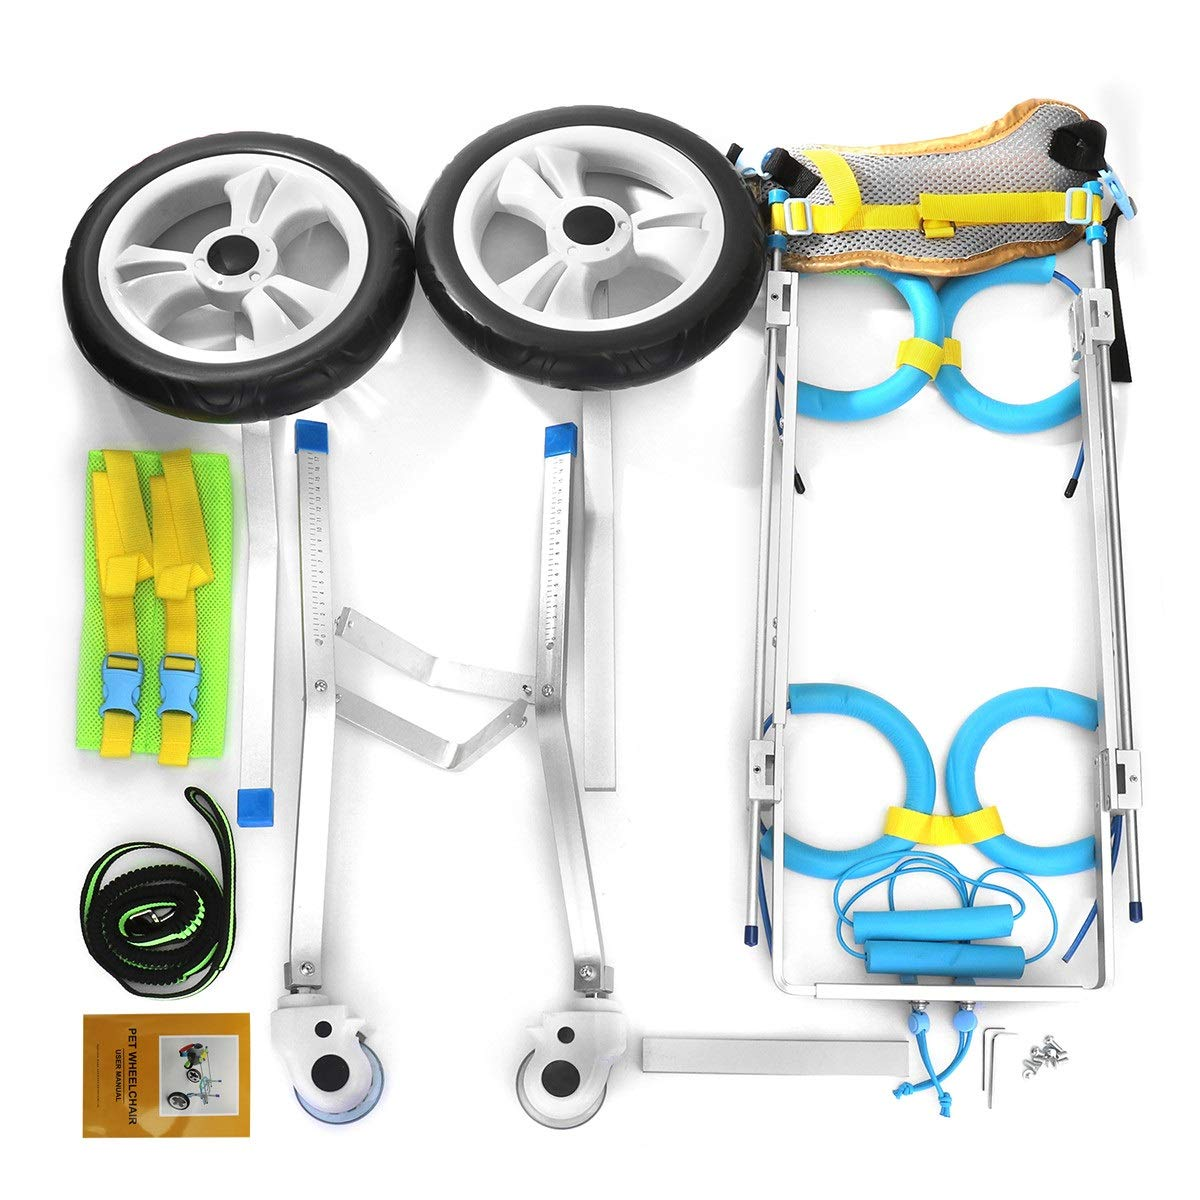 AnnCWLY Carro De Aluminio para Silla De Ruedas para Mascotas, para Discapacitados, Perro, Perro, Patas Traseras Andar 4 Ruedas Ajustable Portátil Llevar ...